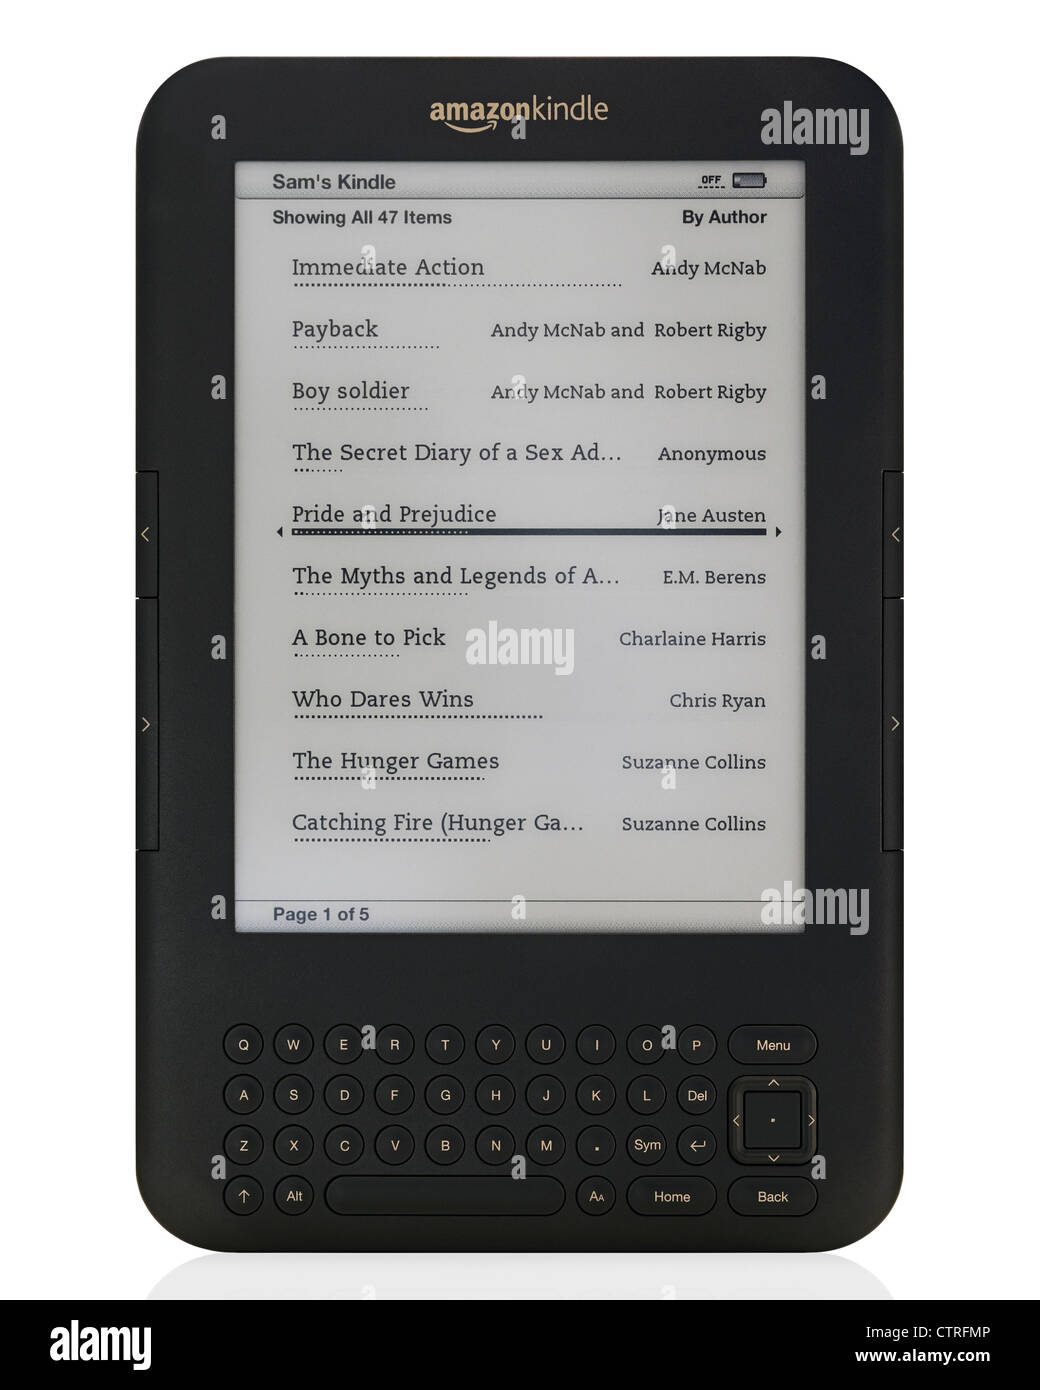 Dispositif de lecture eReader Amazon Kindle Photo Stock